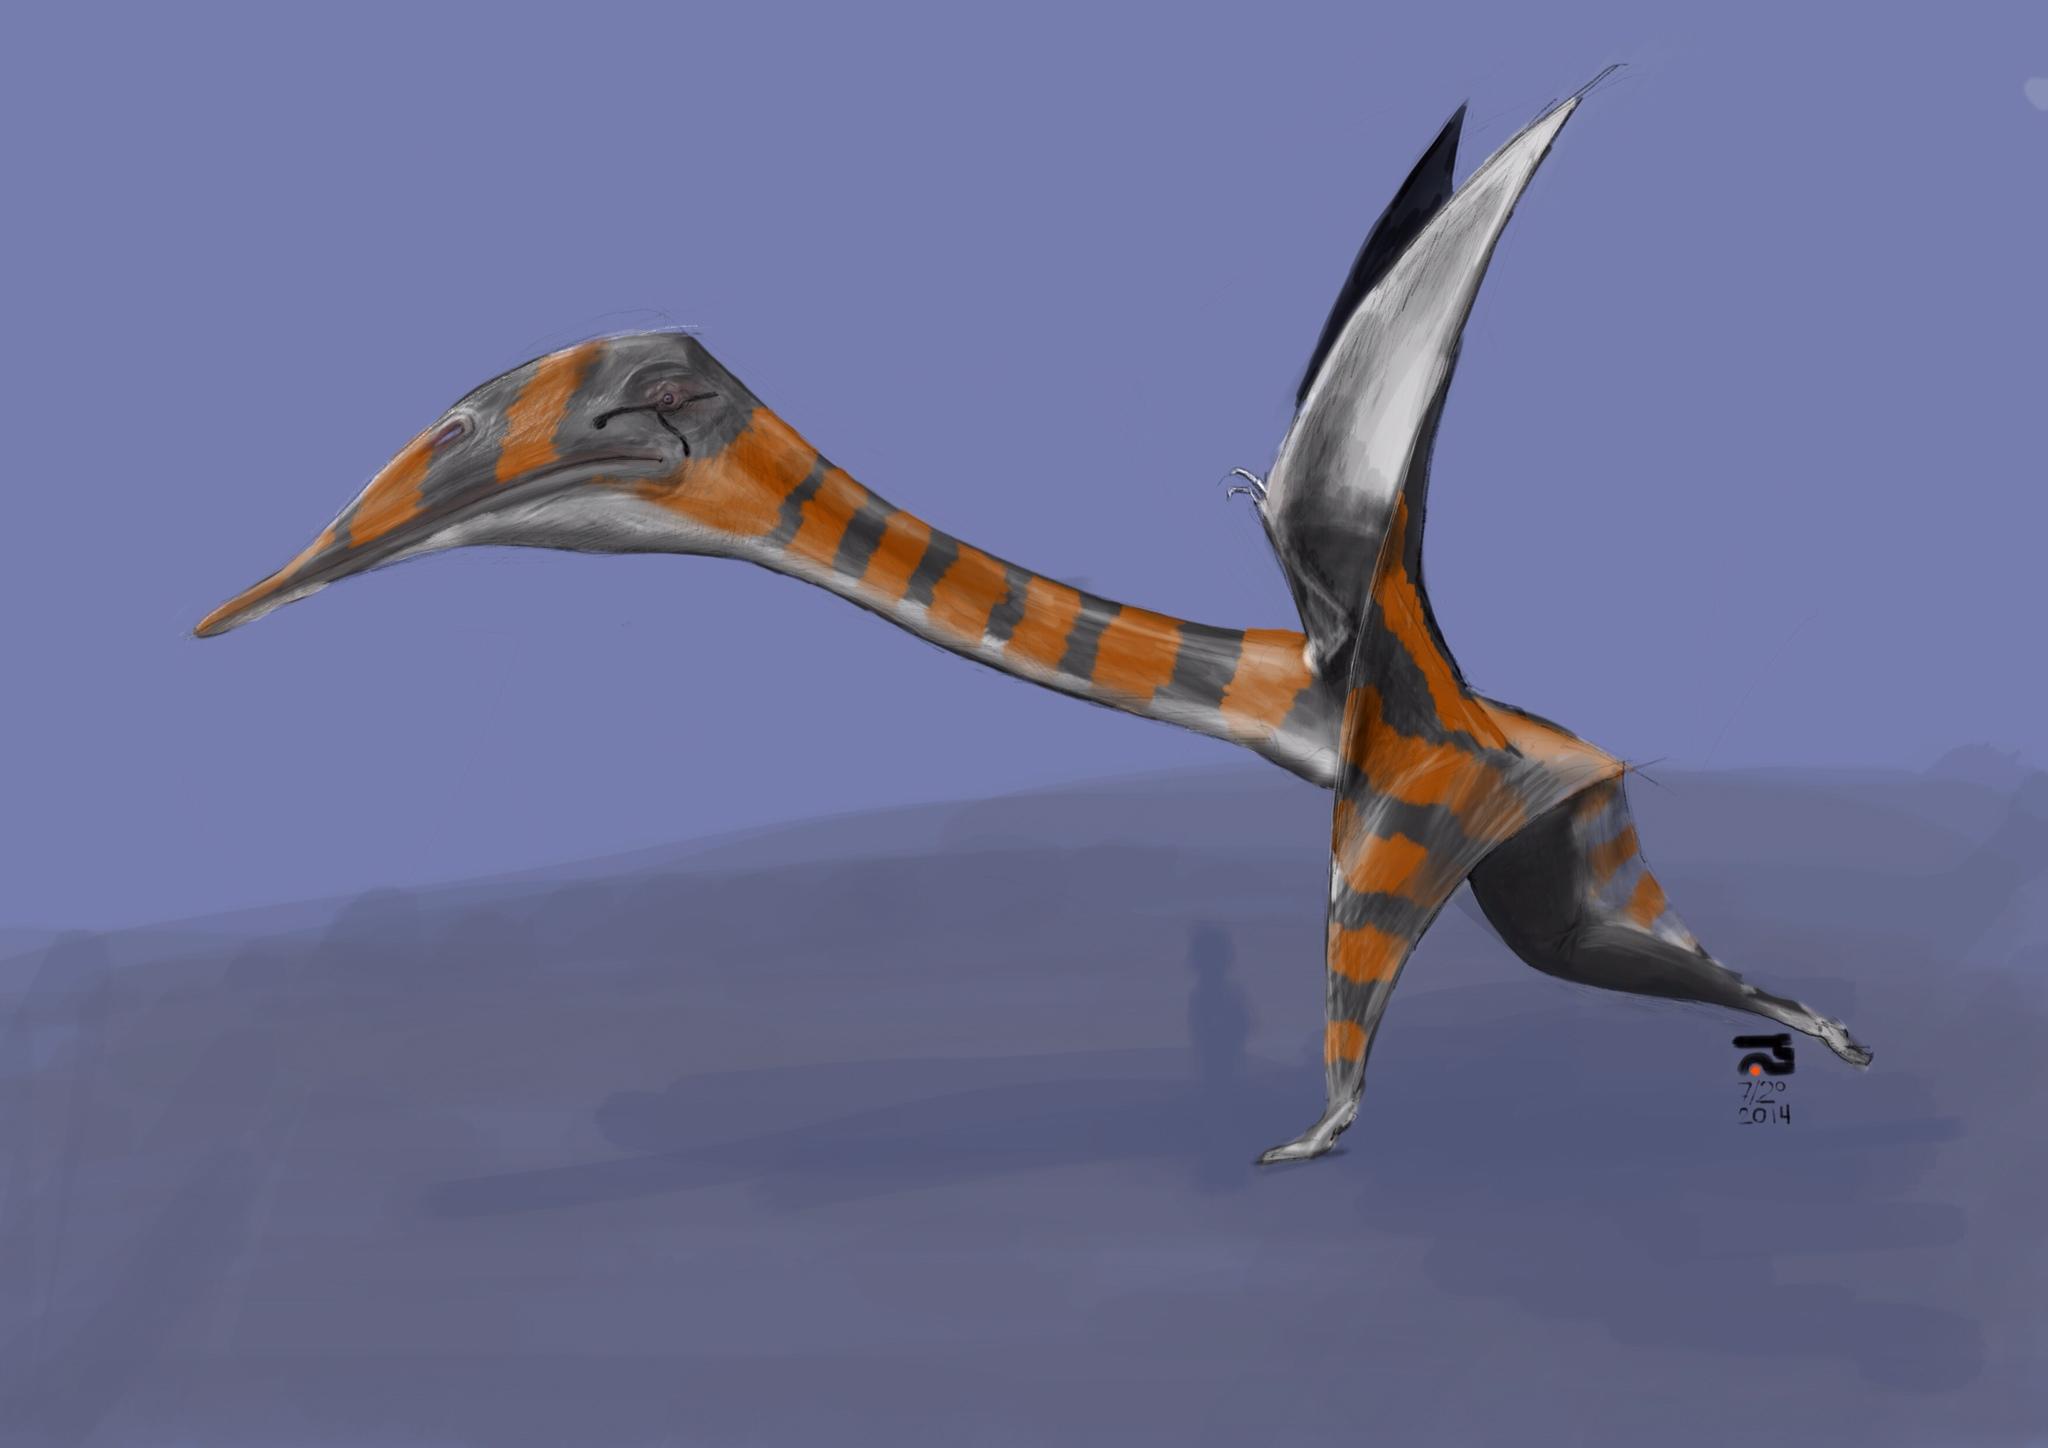 The Quetzlacoatlus Northropi